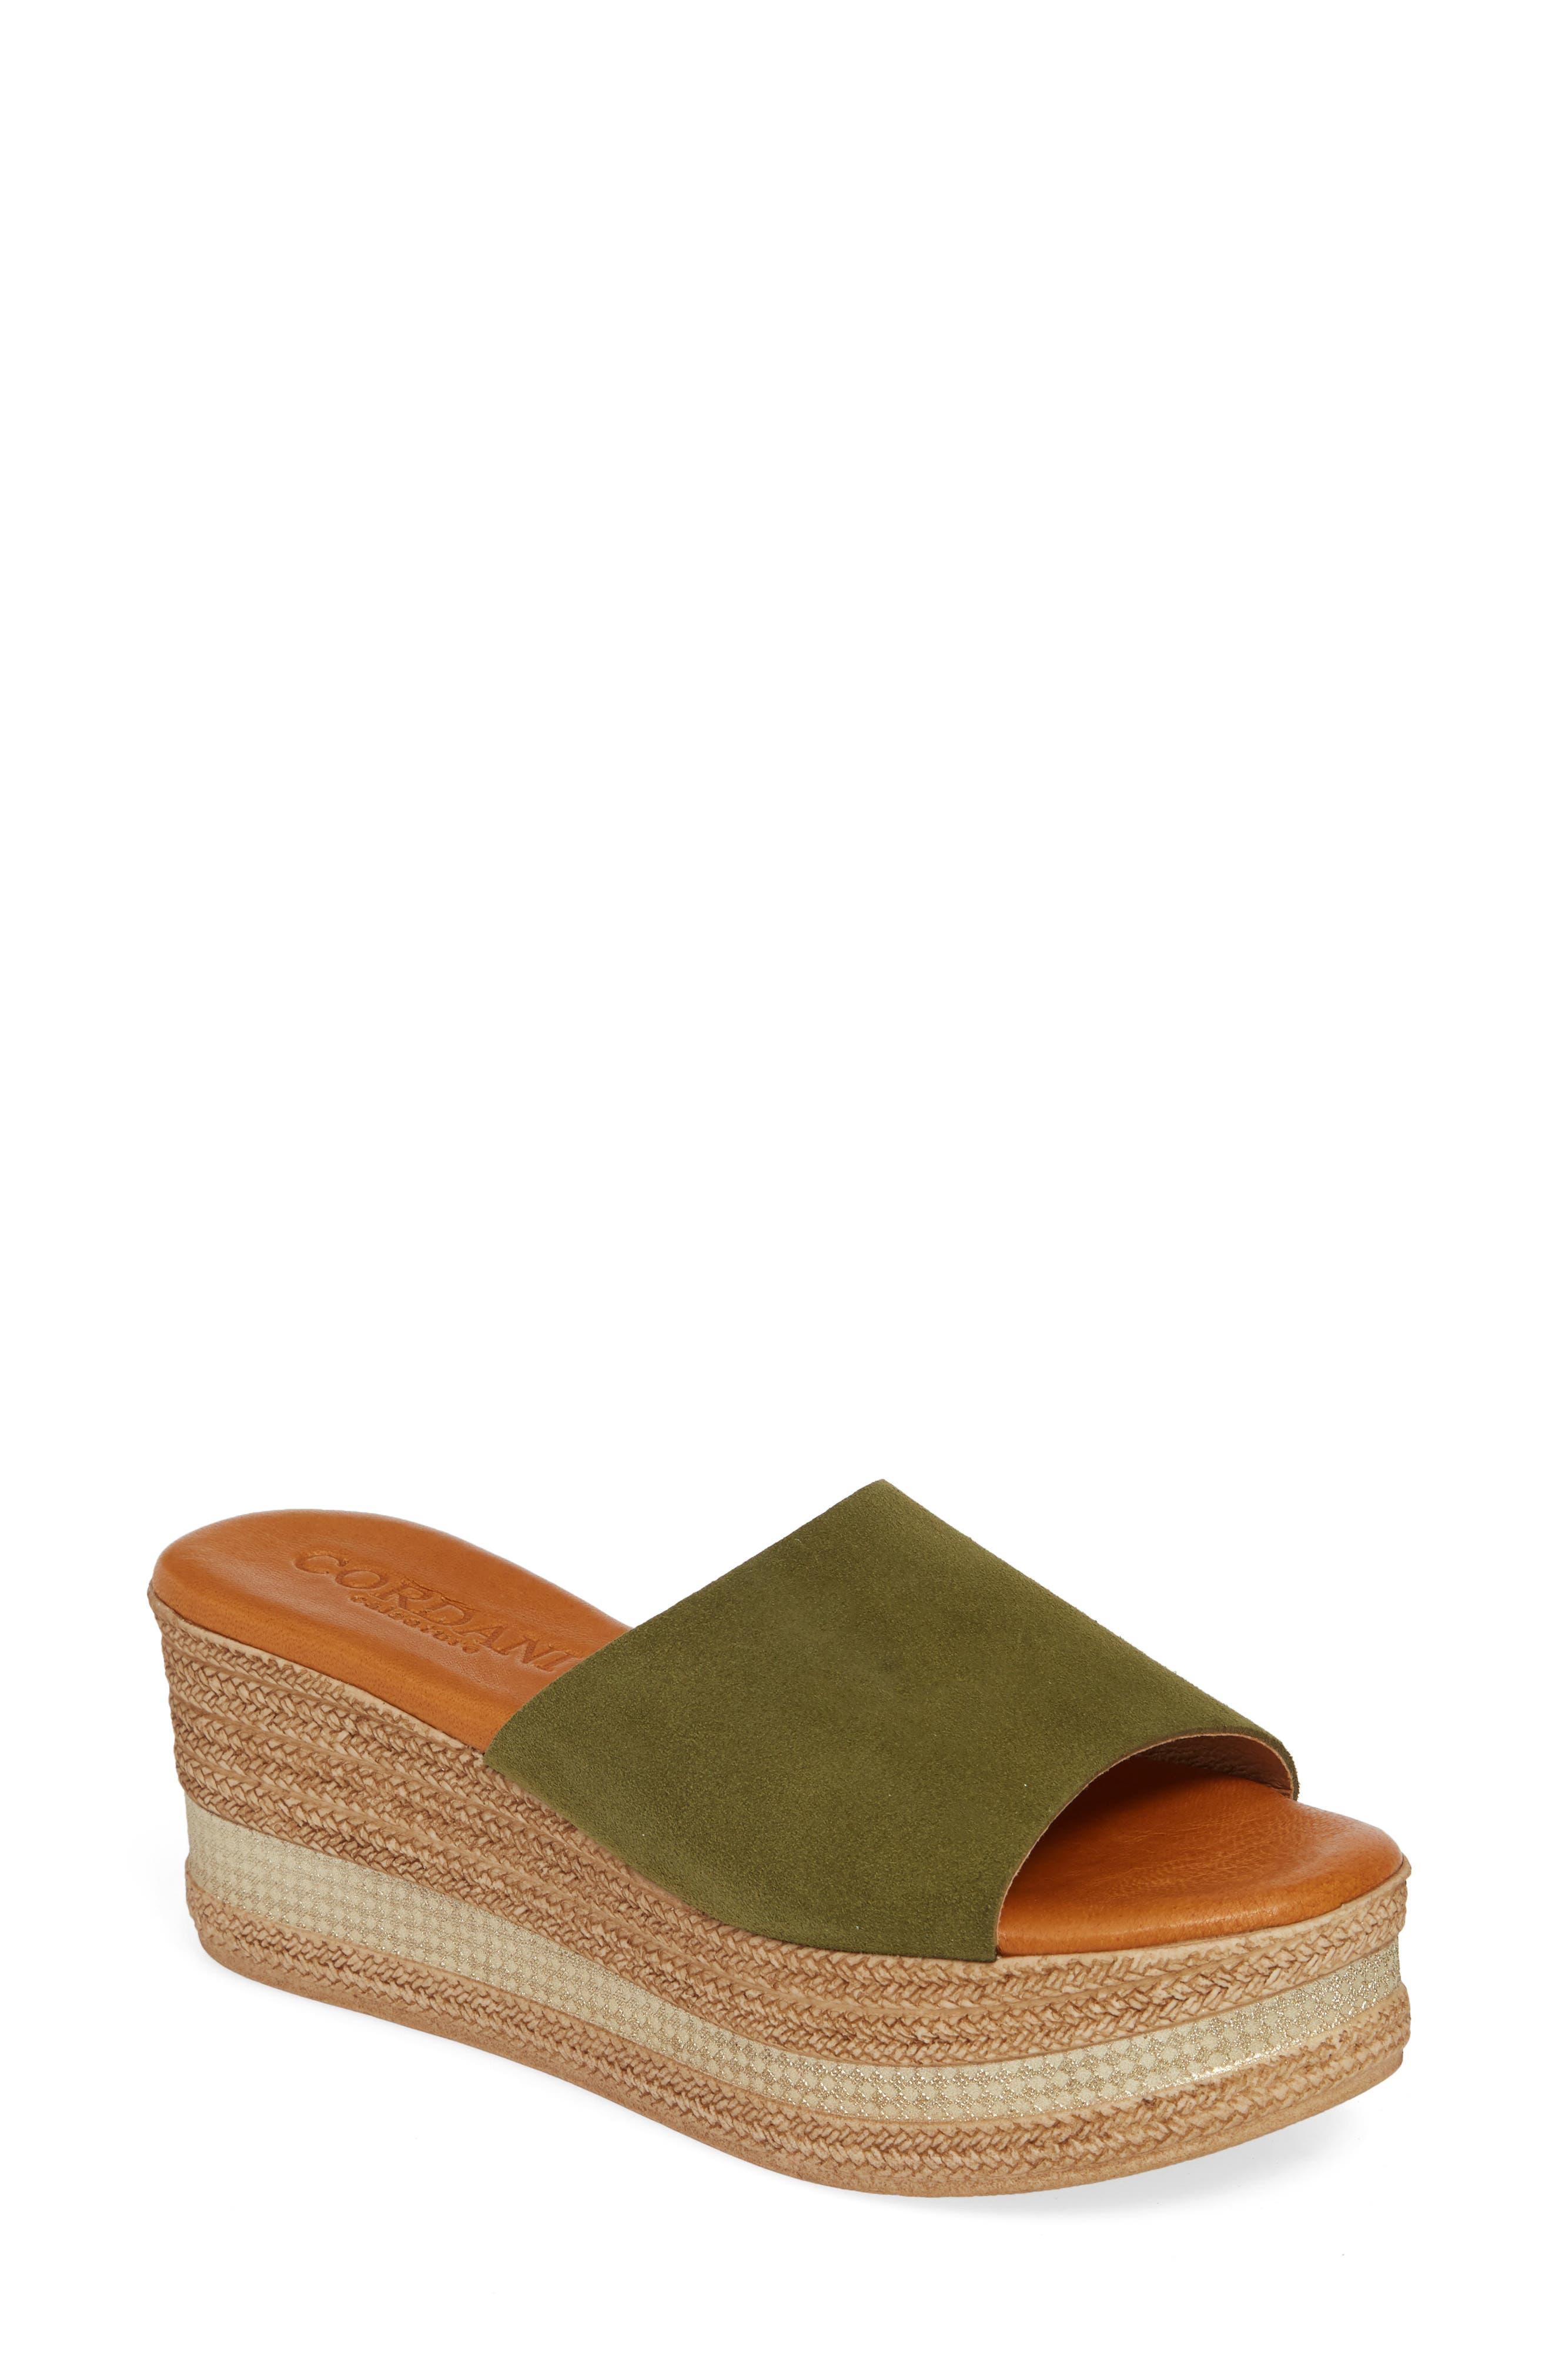 Cordani Barbara Wedge Slide Sandal - Green